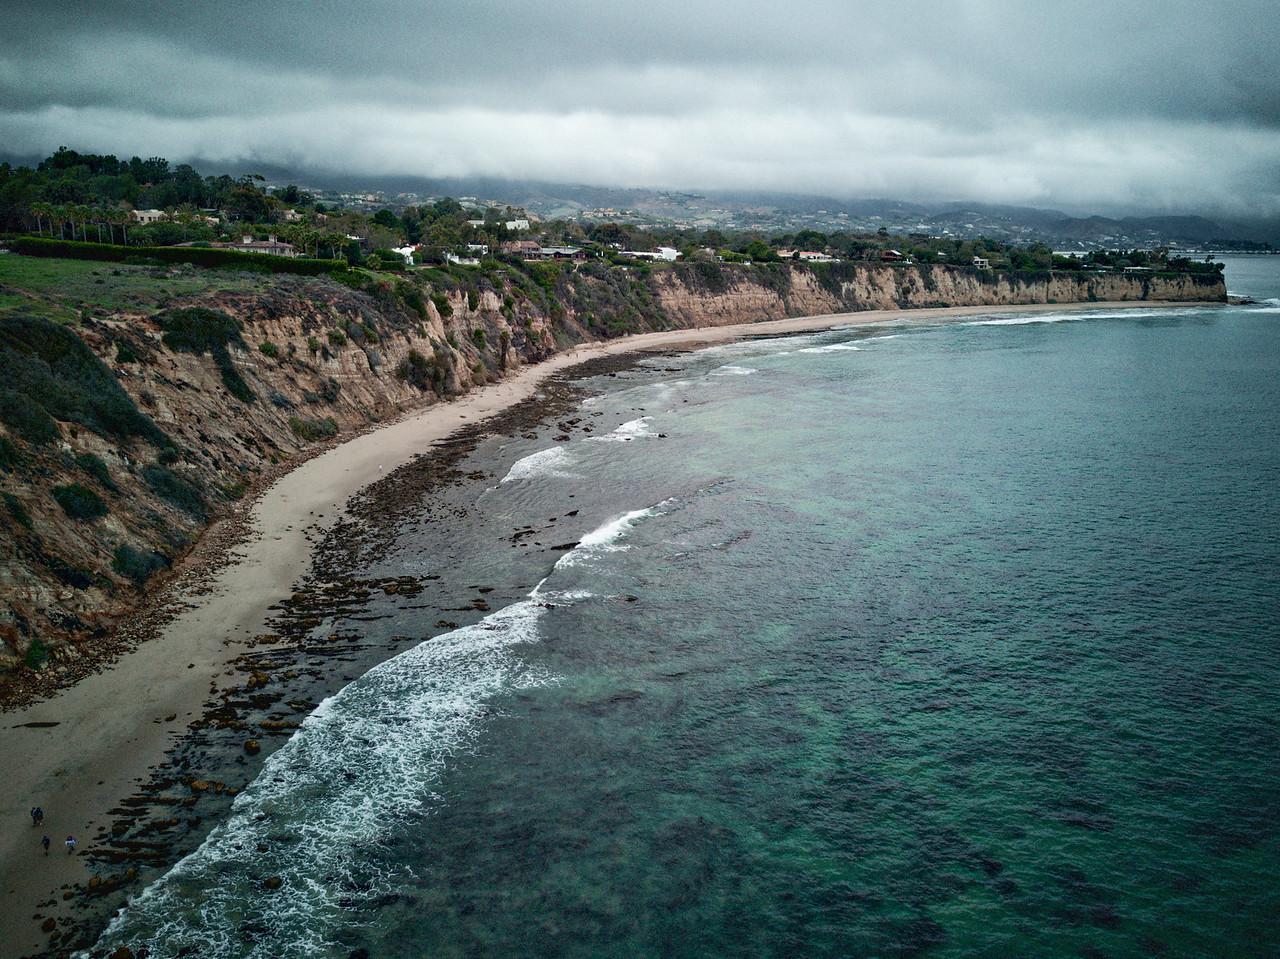 coldence of the wind... mavic.   #djimavic #dji #malibu #california